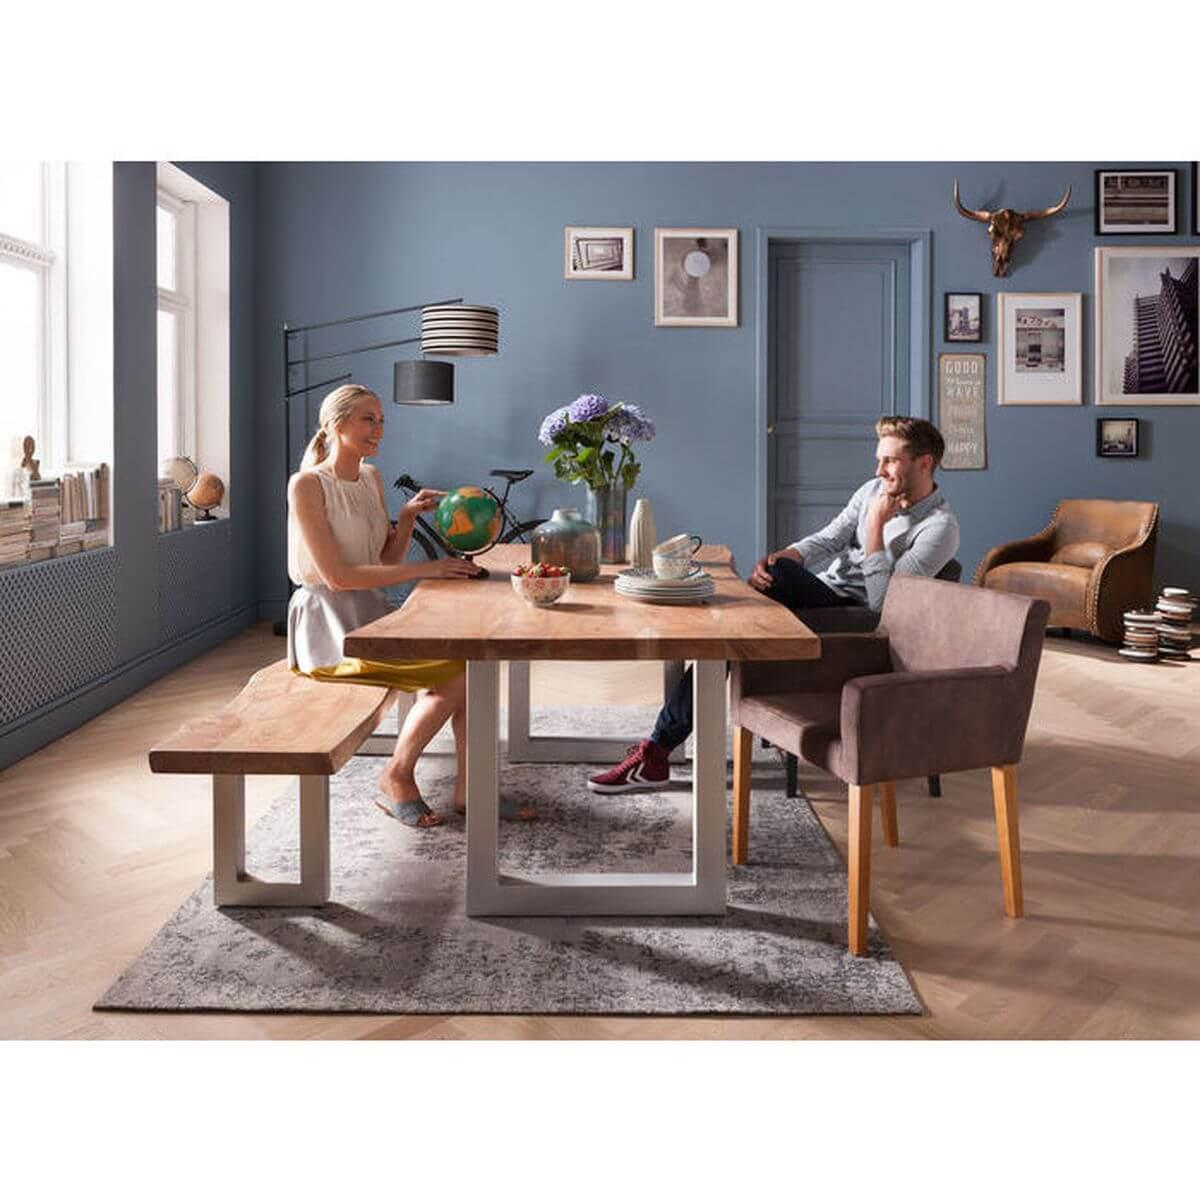 Table 195x100cm PURE Kare Design nature